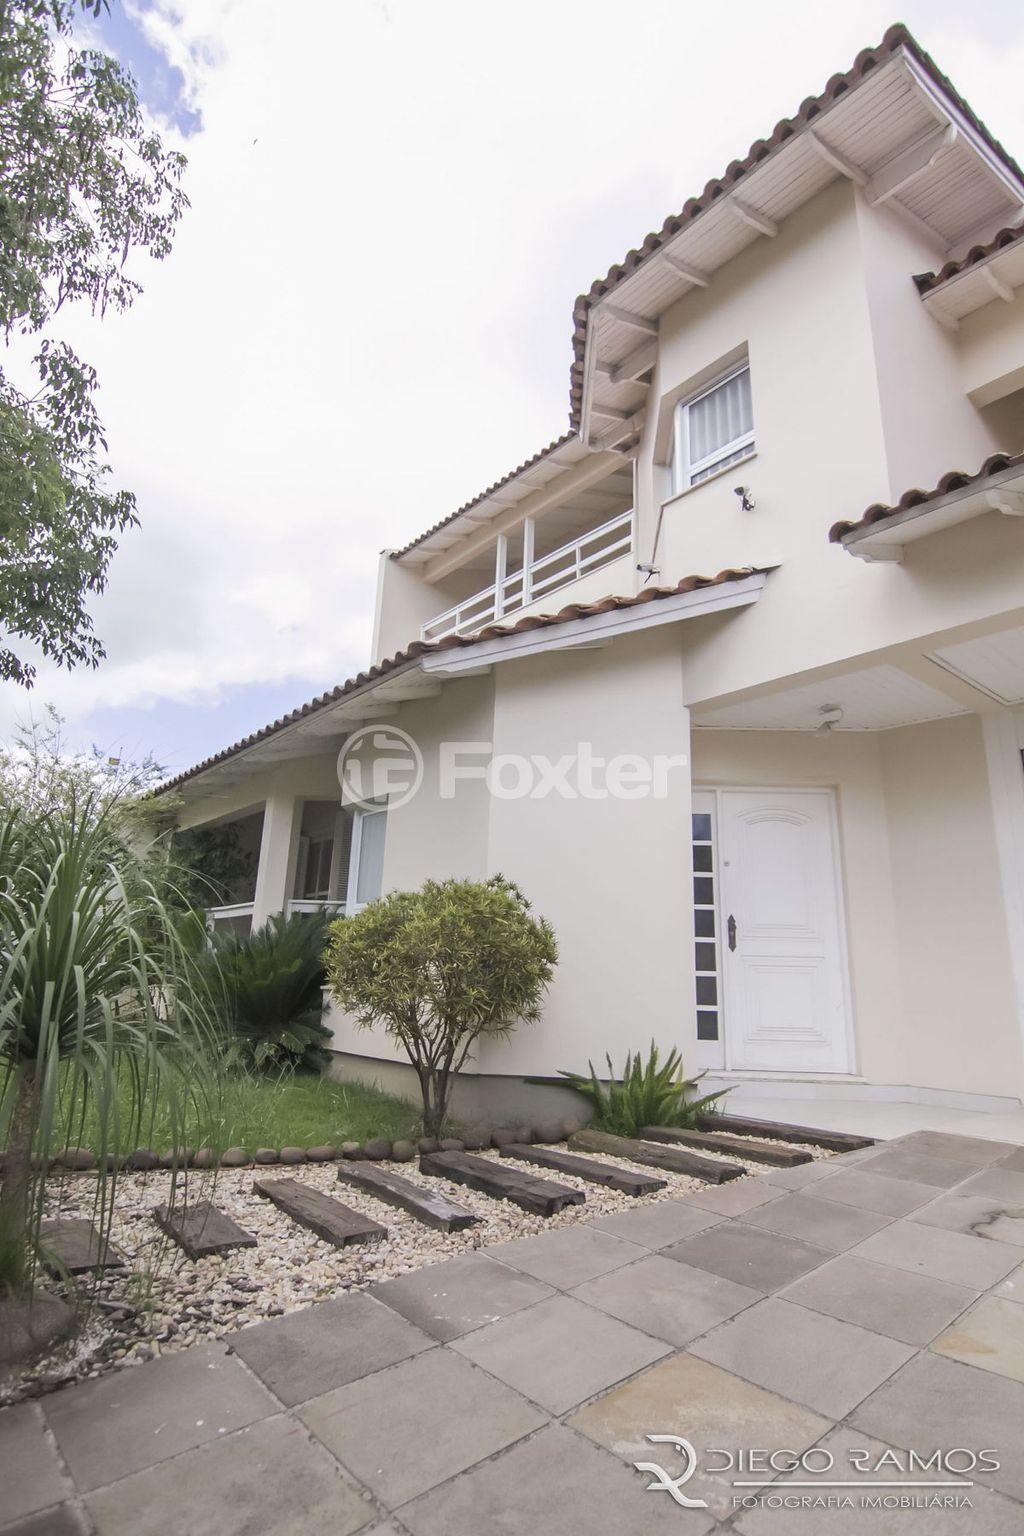 Casa 5 Dorm, Marechal Rondon, Canoas (143576) - Foto 2